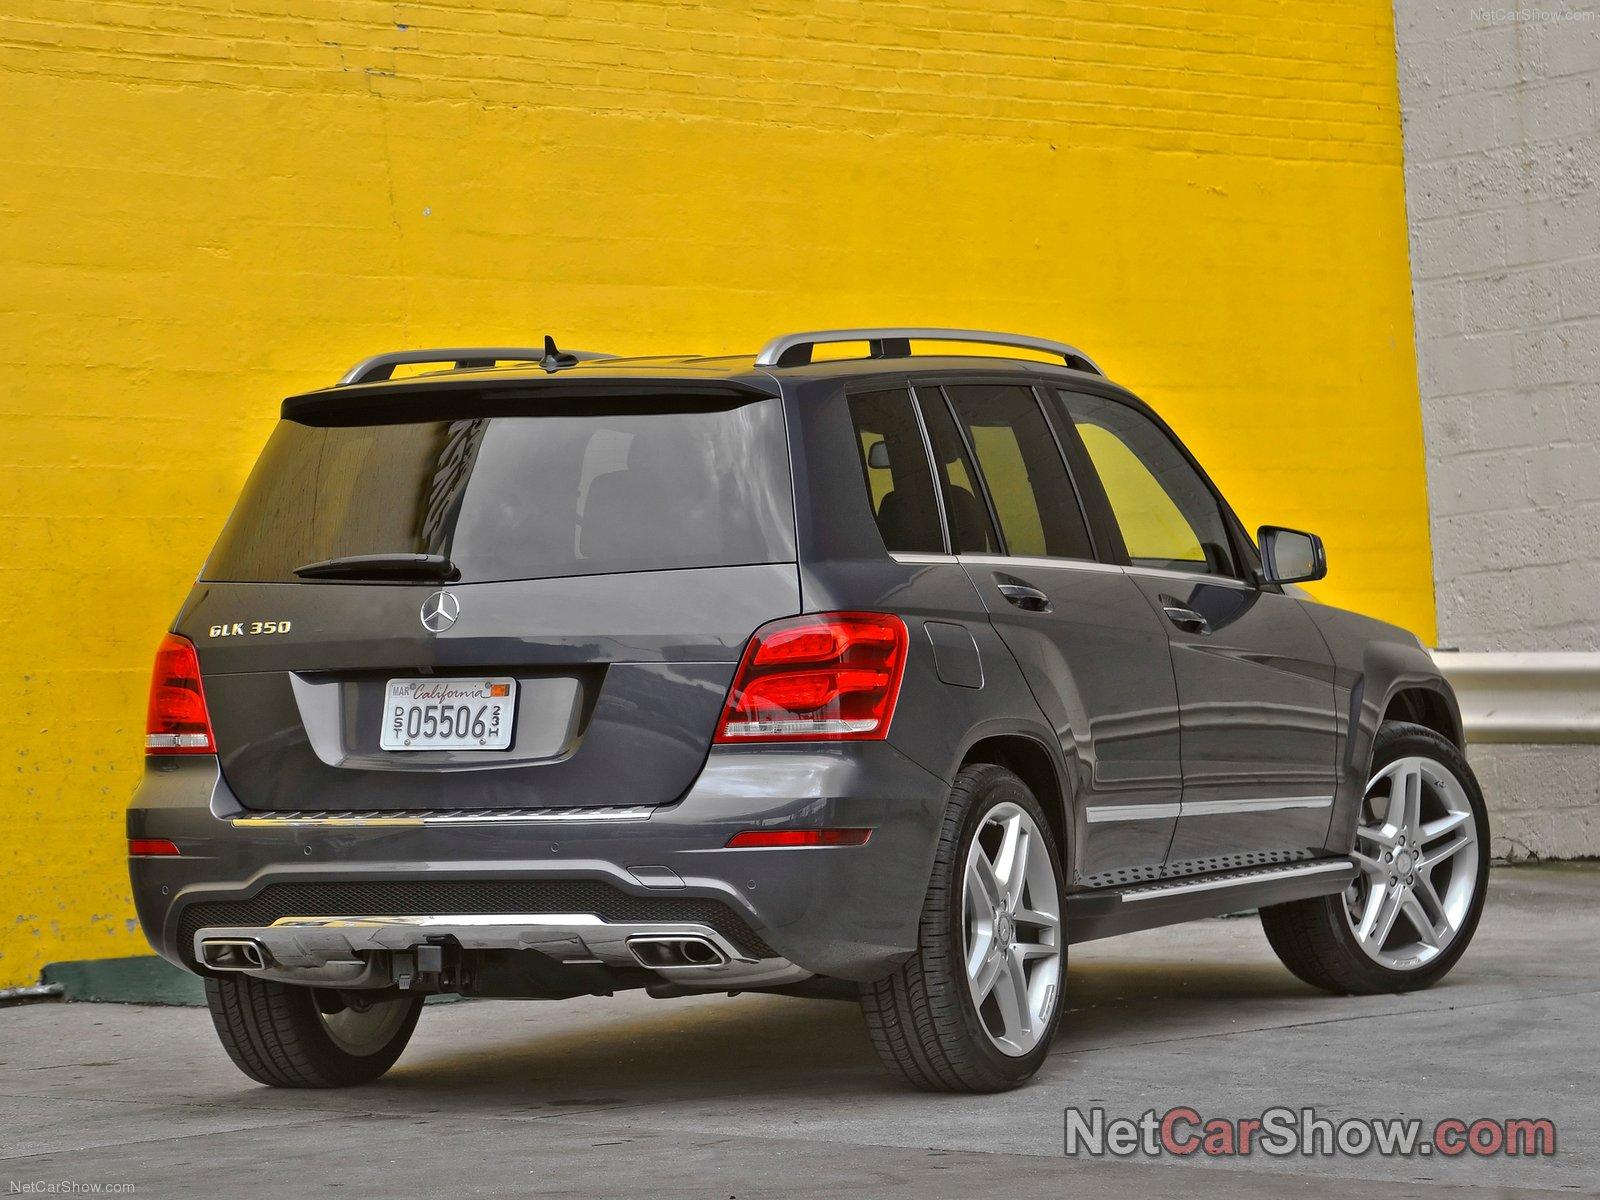 Mercedes-Benz GLK AMG photos - Photo Gallery Page #2| CarsBase.com